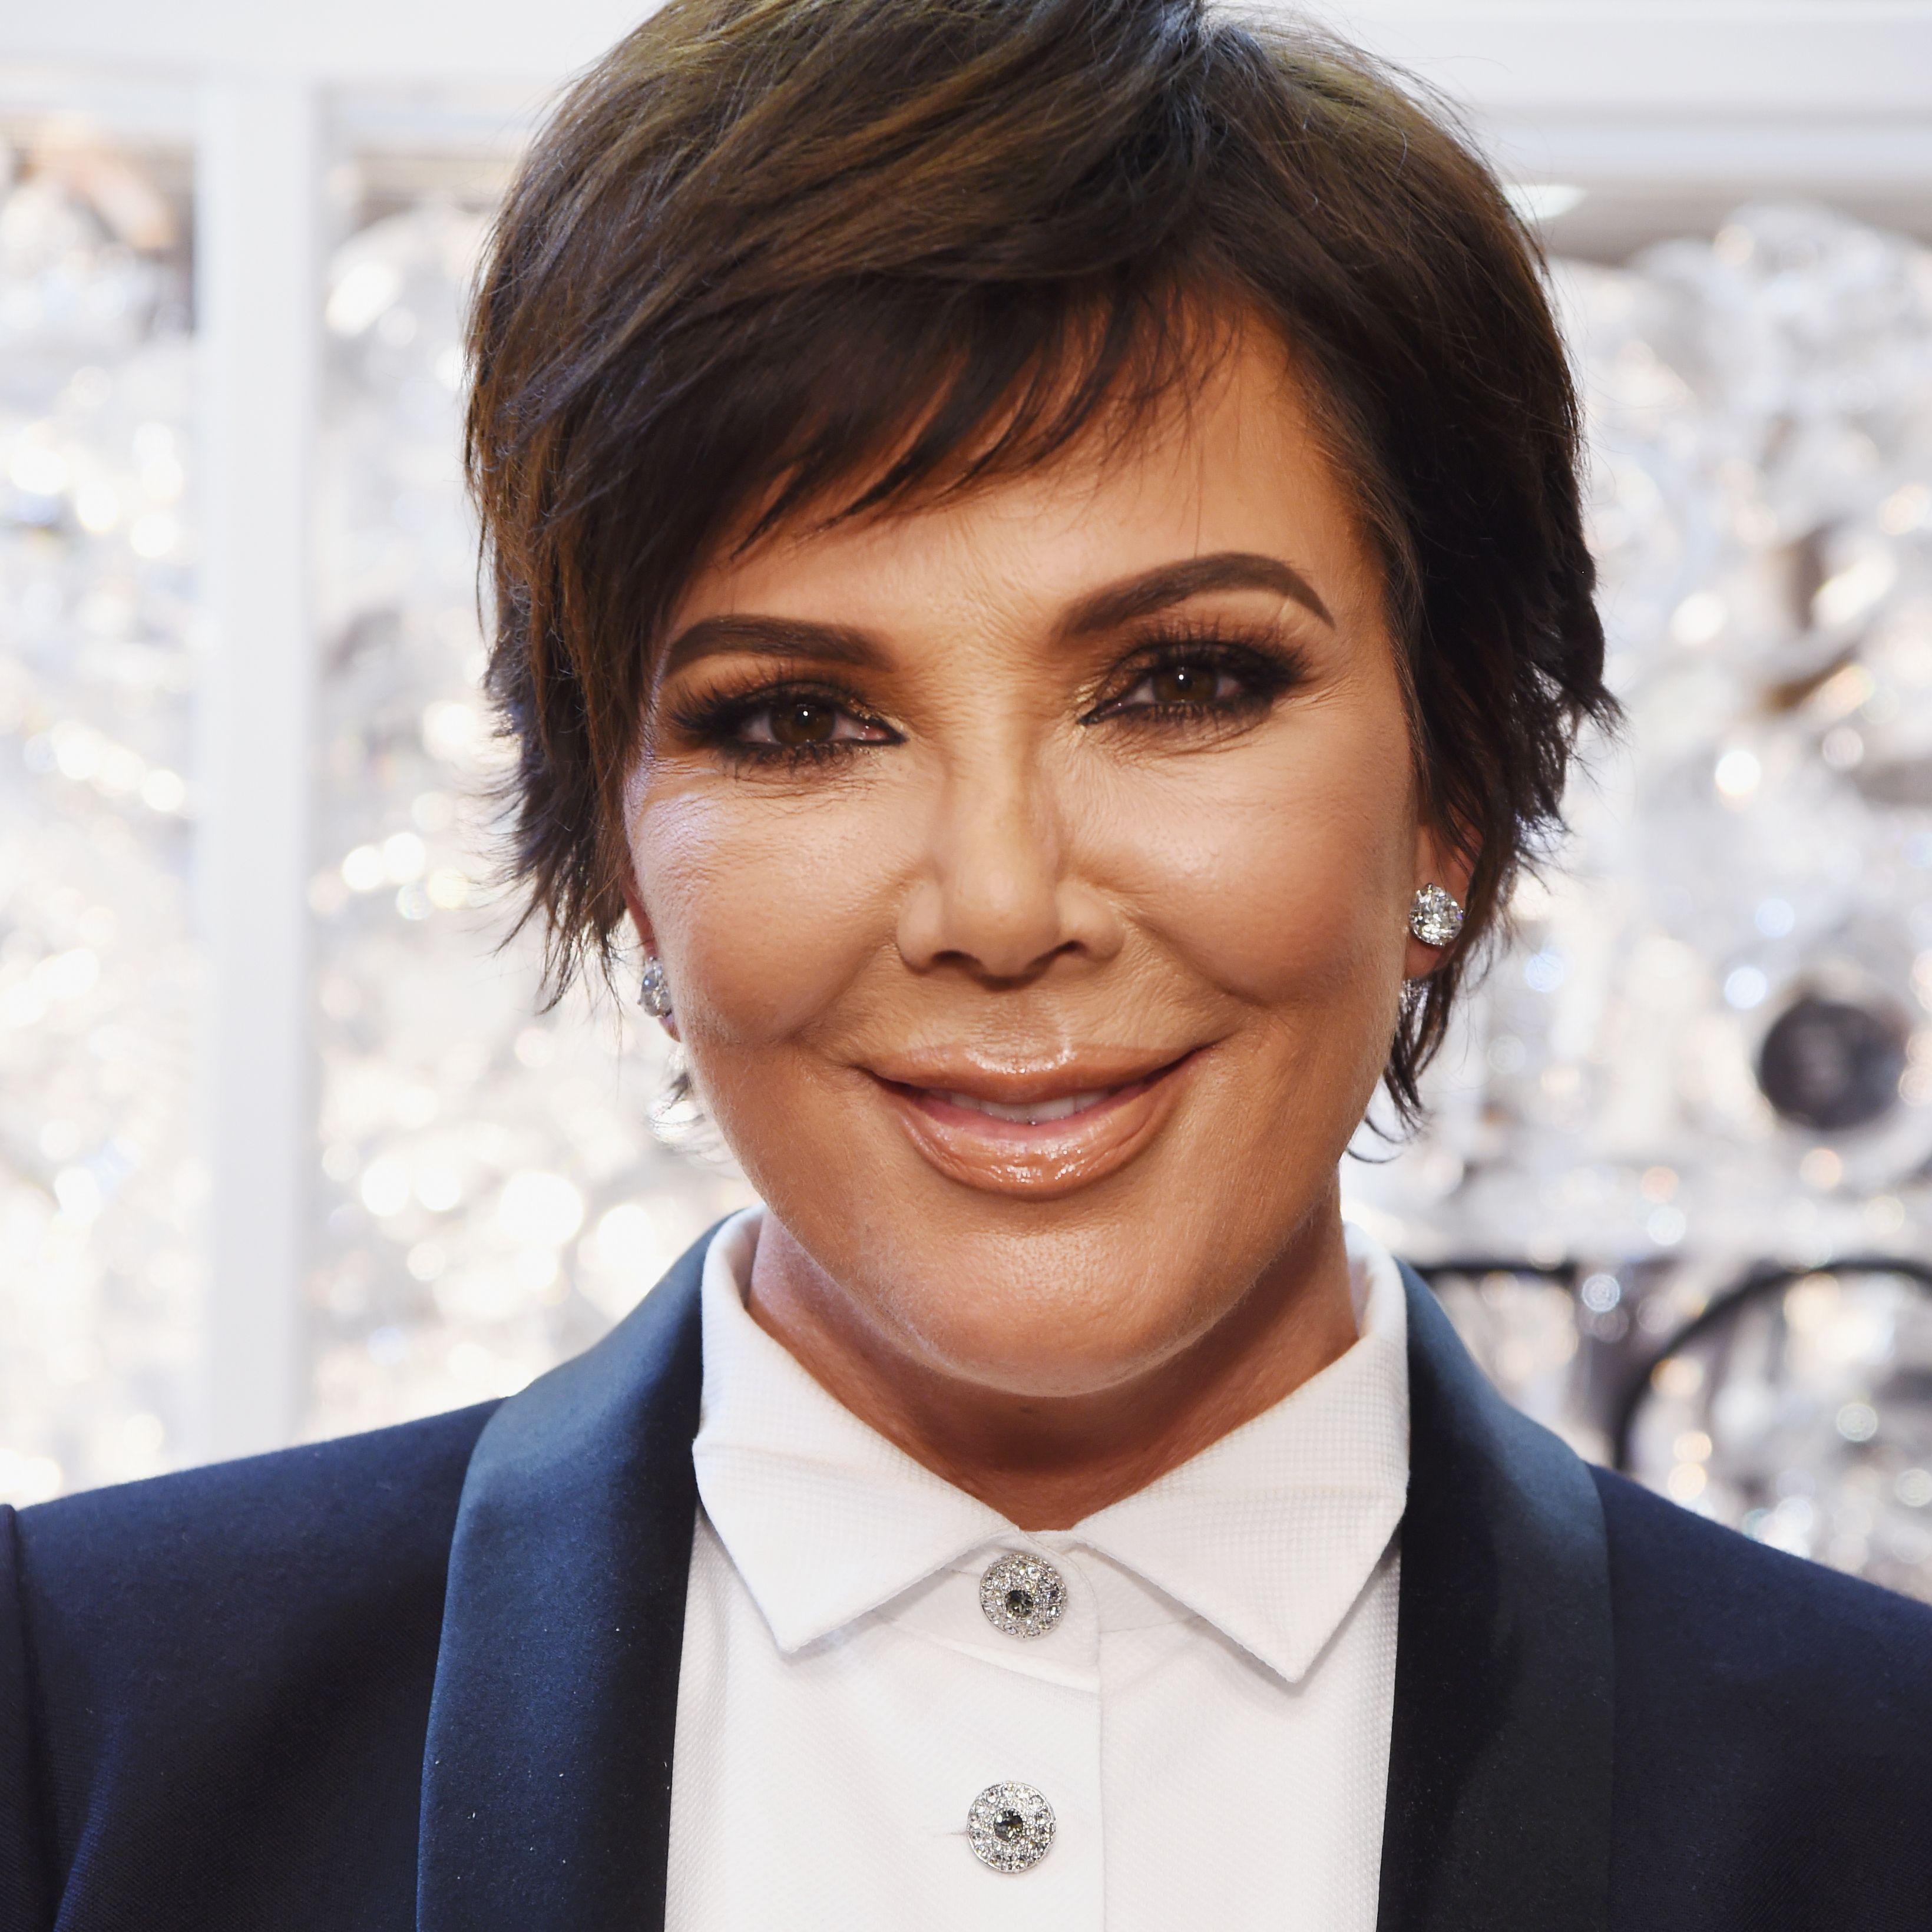 Kris Jenner Just Posted A No-Makeup Selfie On Instagram